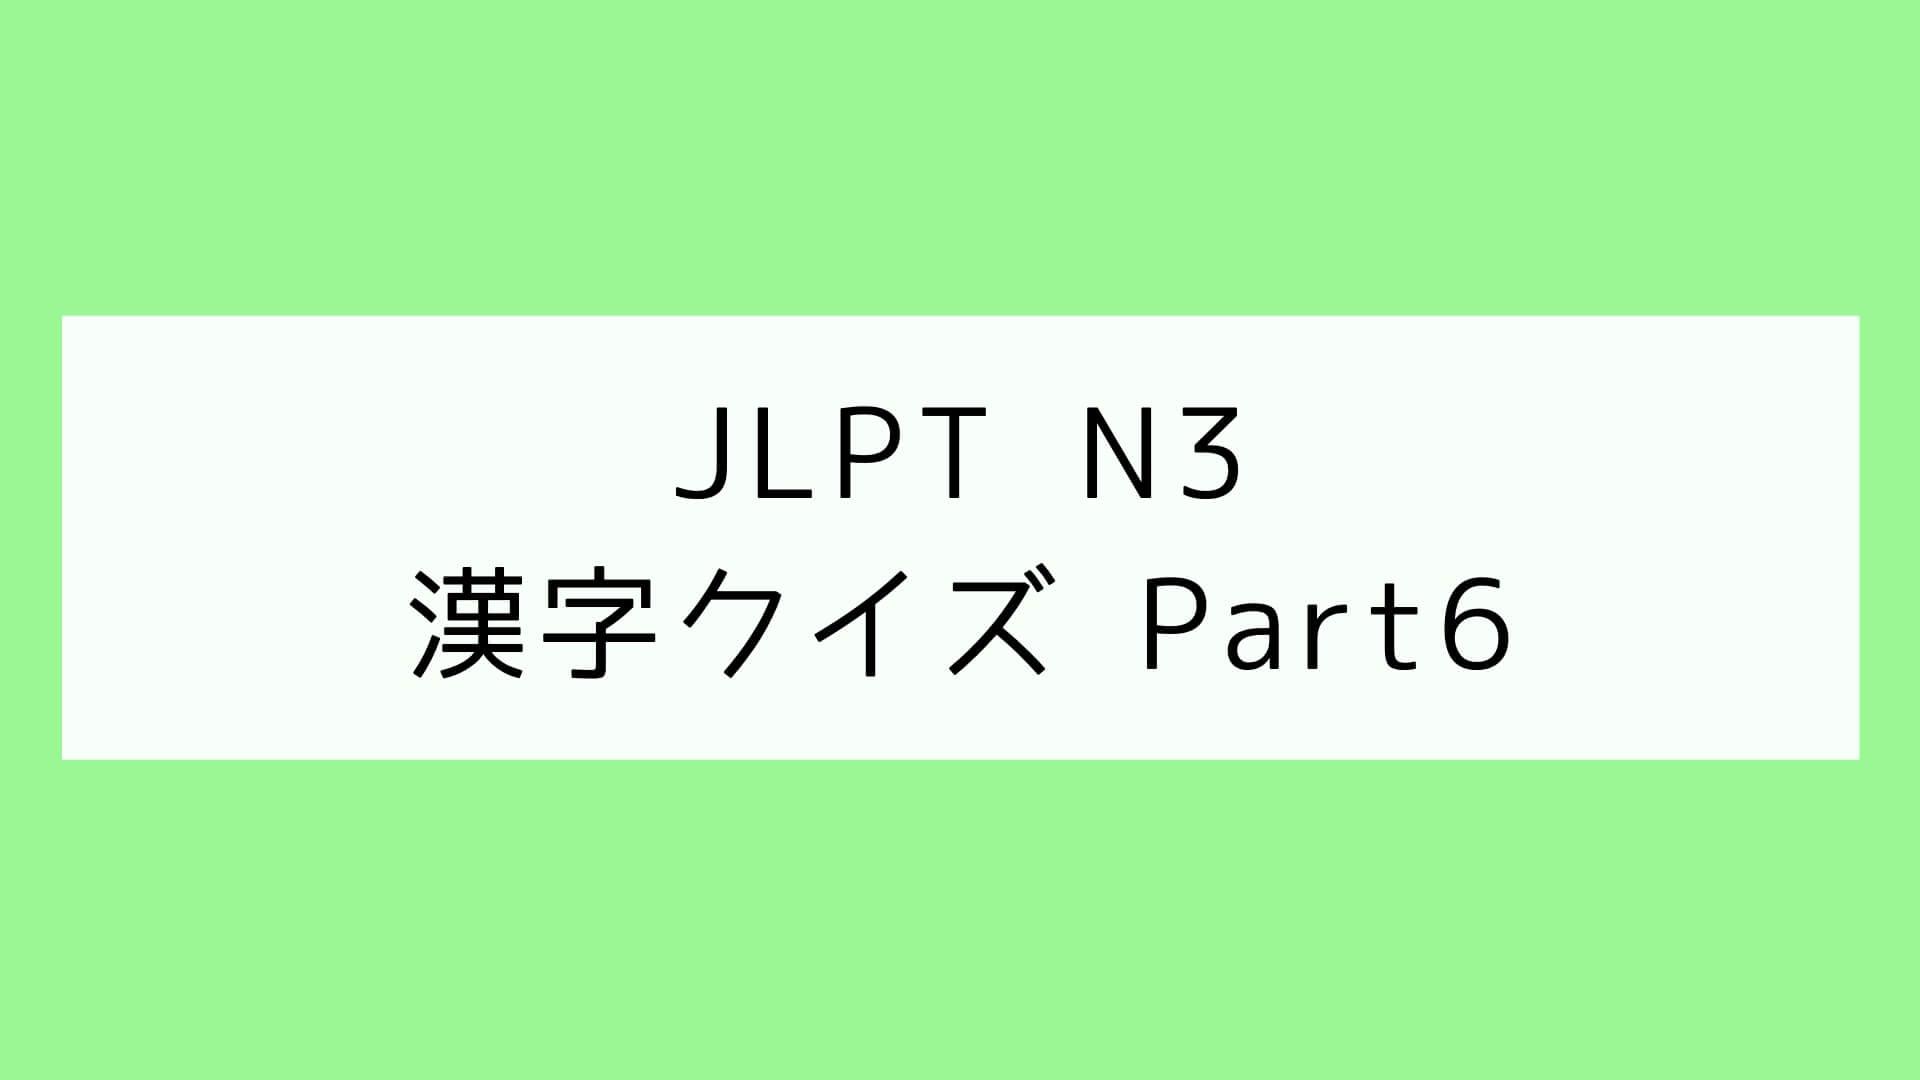 【JLPT N3】漢字クイズ Part6